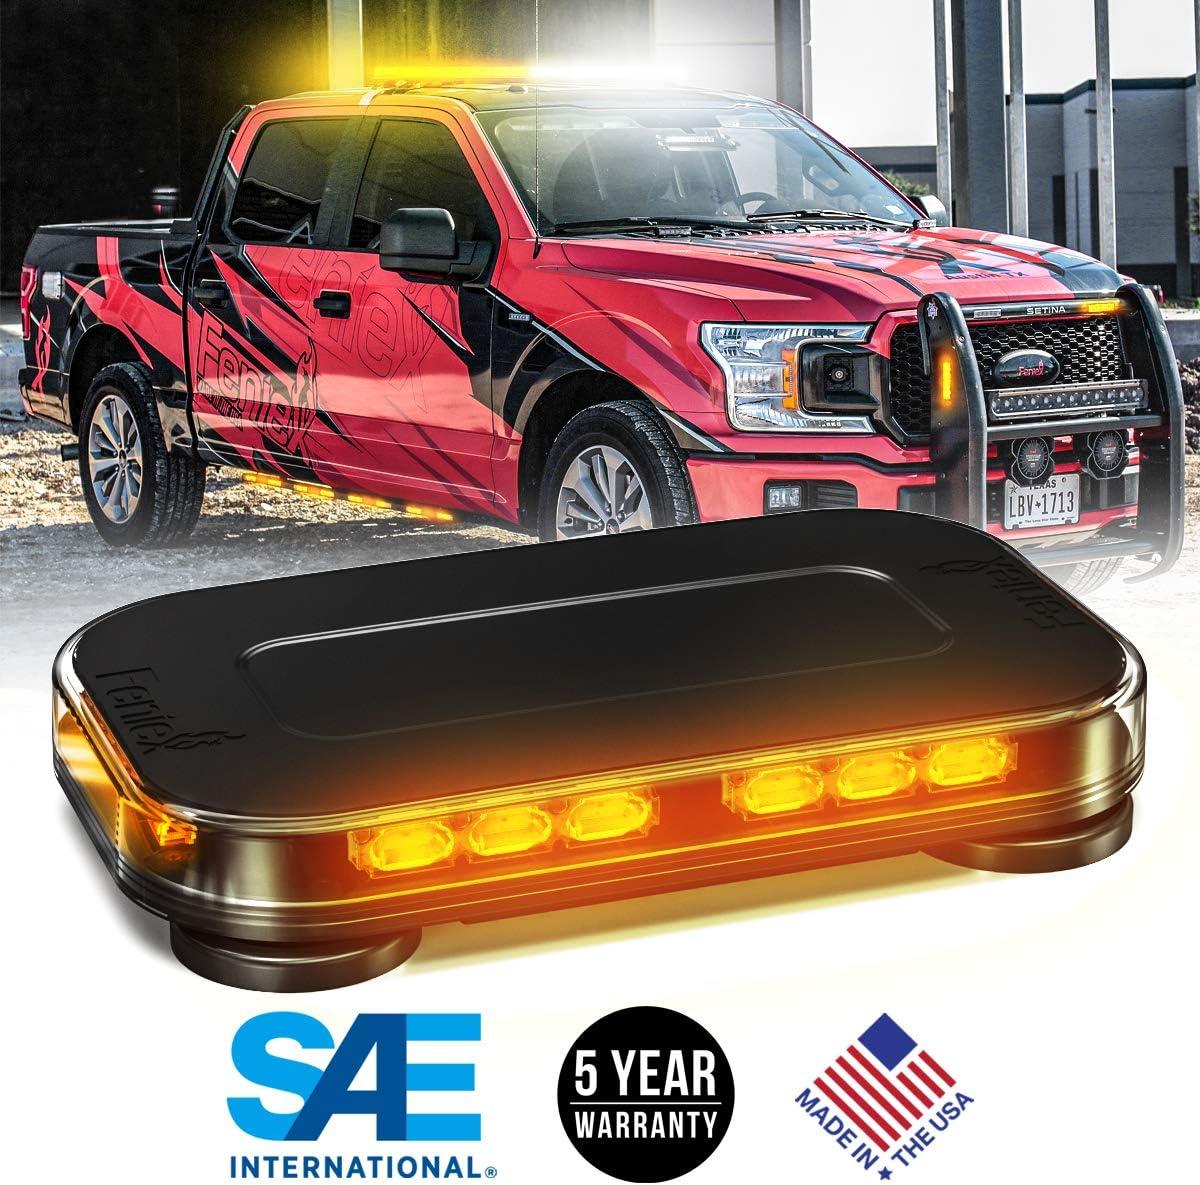 "FENIEX GEO Series 14"" LED Mini Light Bar - [SAE Class 1] [Made in USA] [5 Year Warranty] (Amber)"